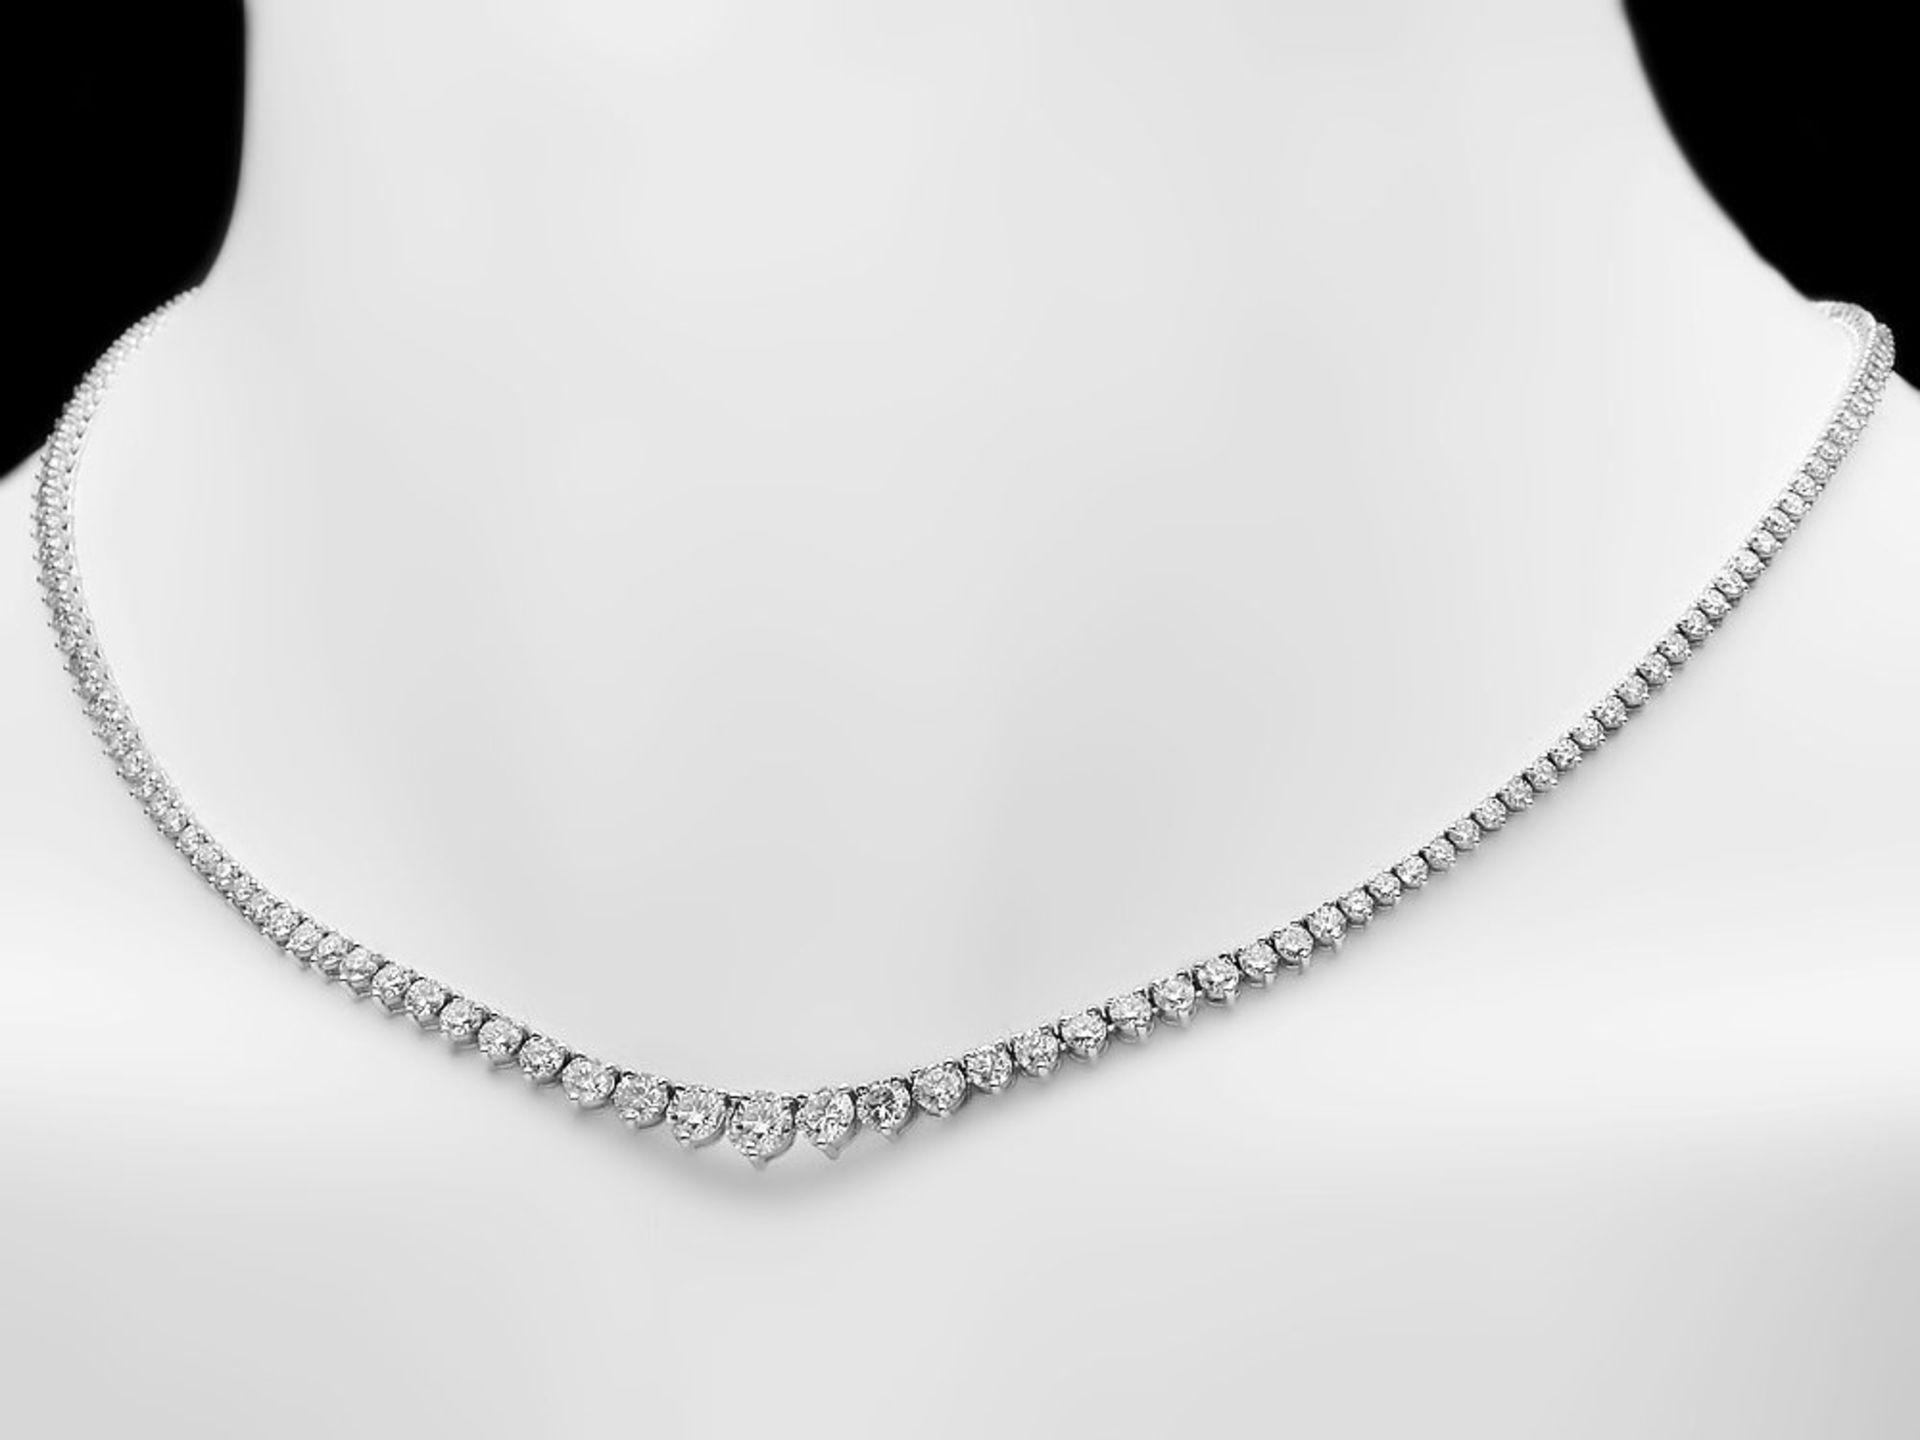 18k White Gold 9.50ct Diamond Necklace - Image 2 of 5